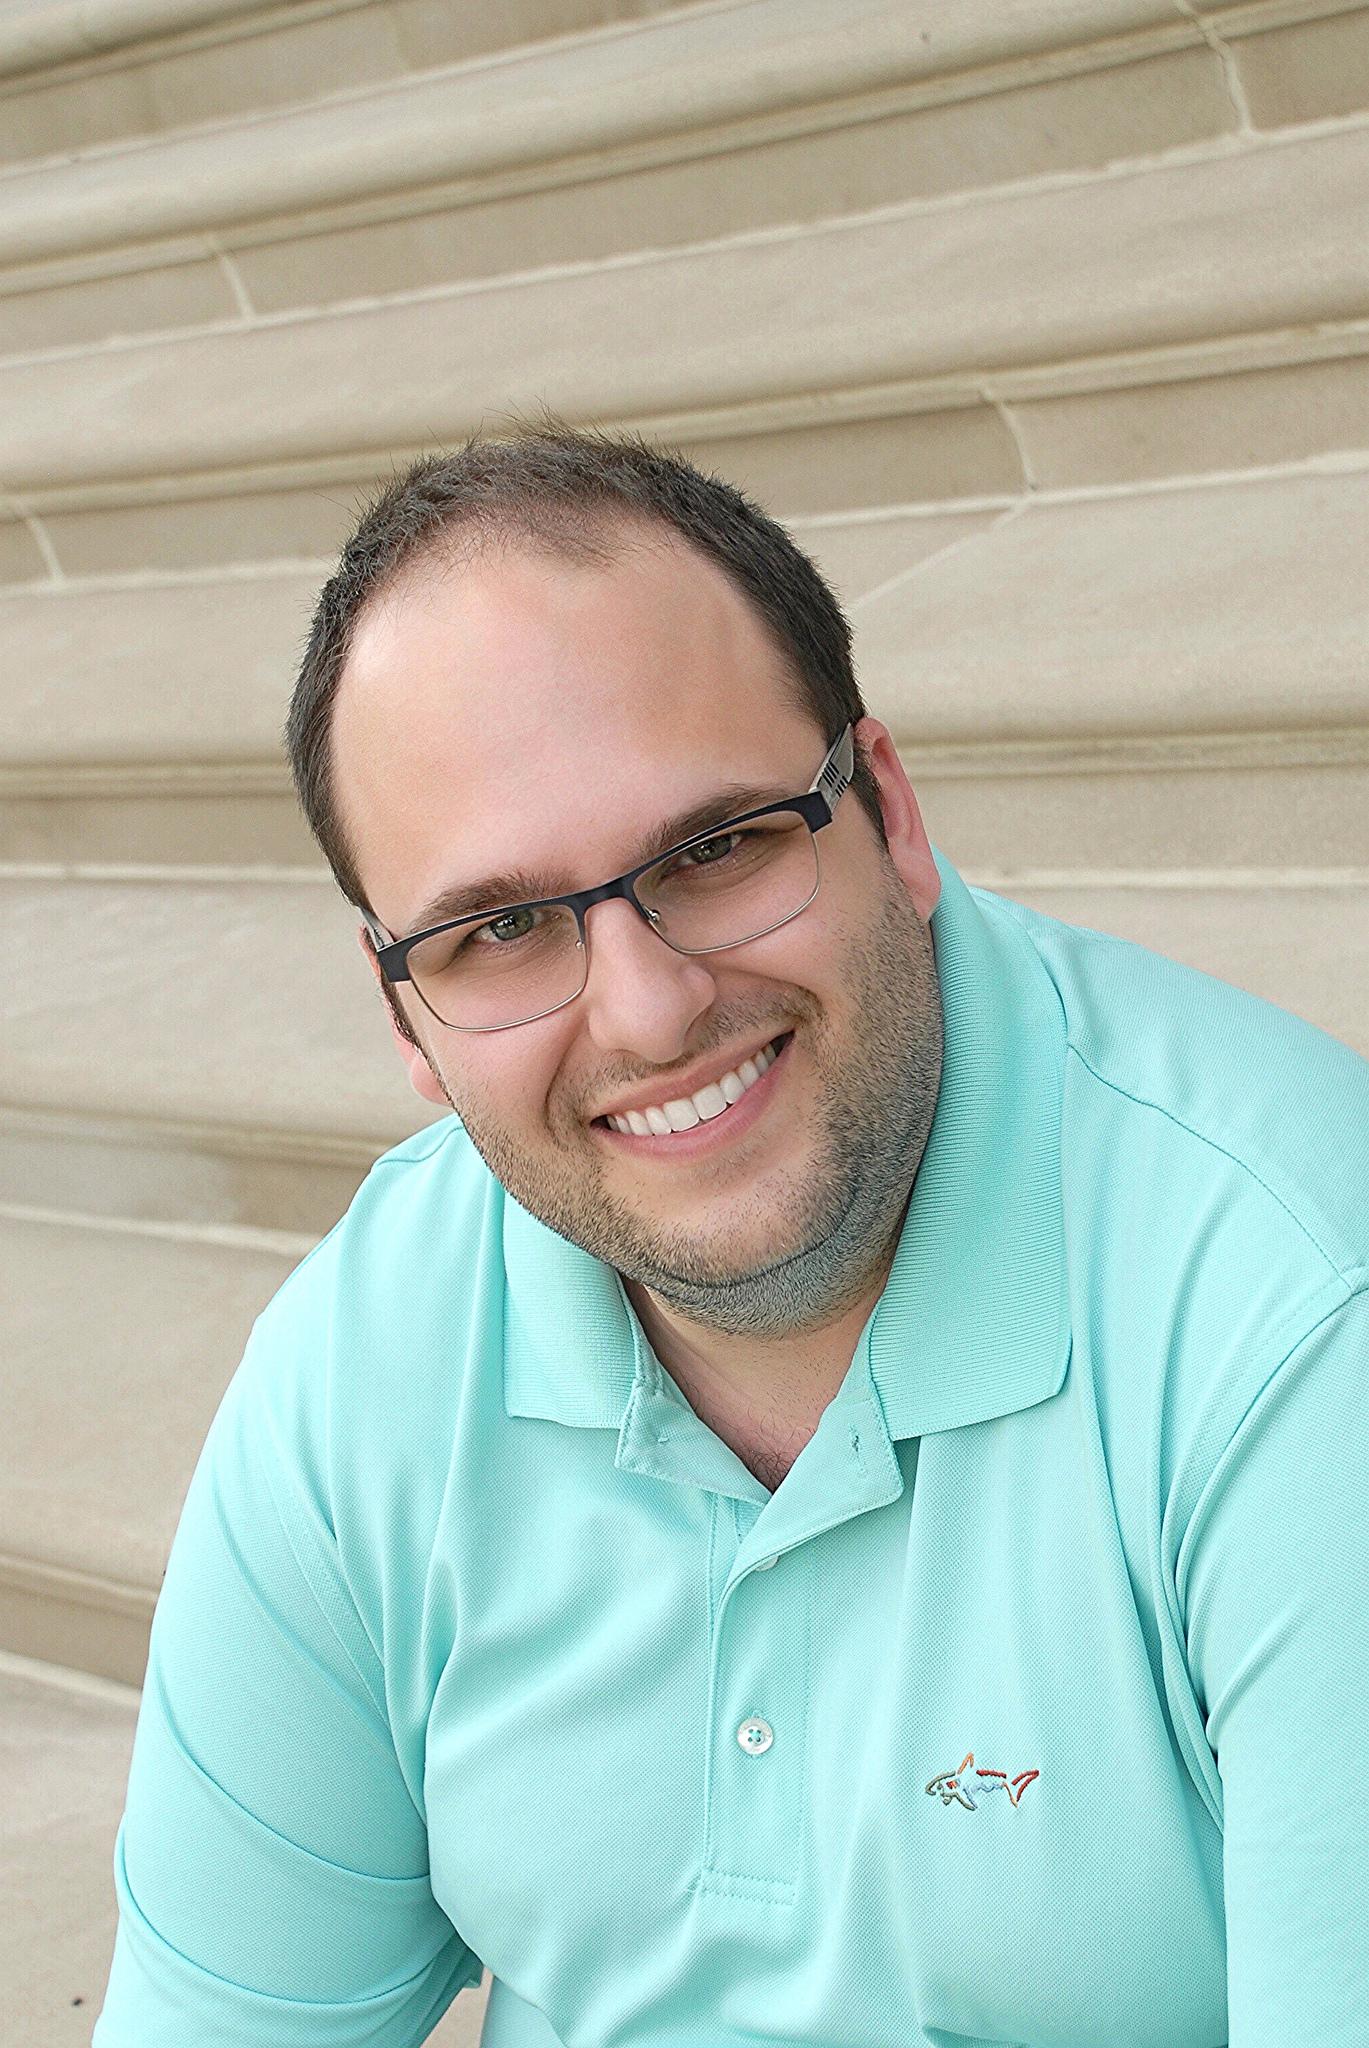 Bret Hirsch